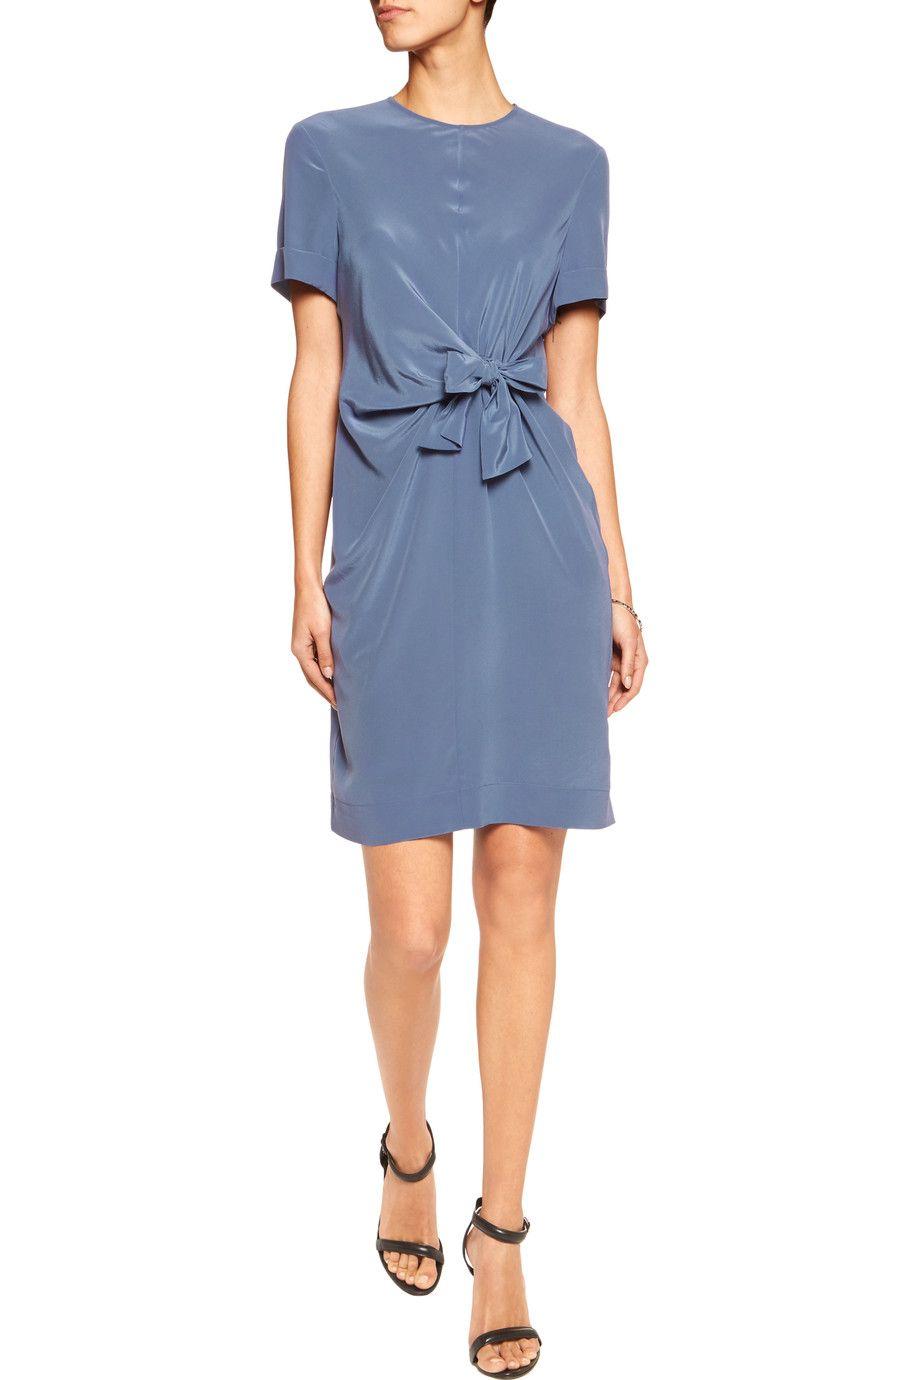 Iris and InkDaniella tie-front silk-crepe dress | Woman\'s apparel ...